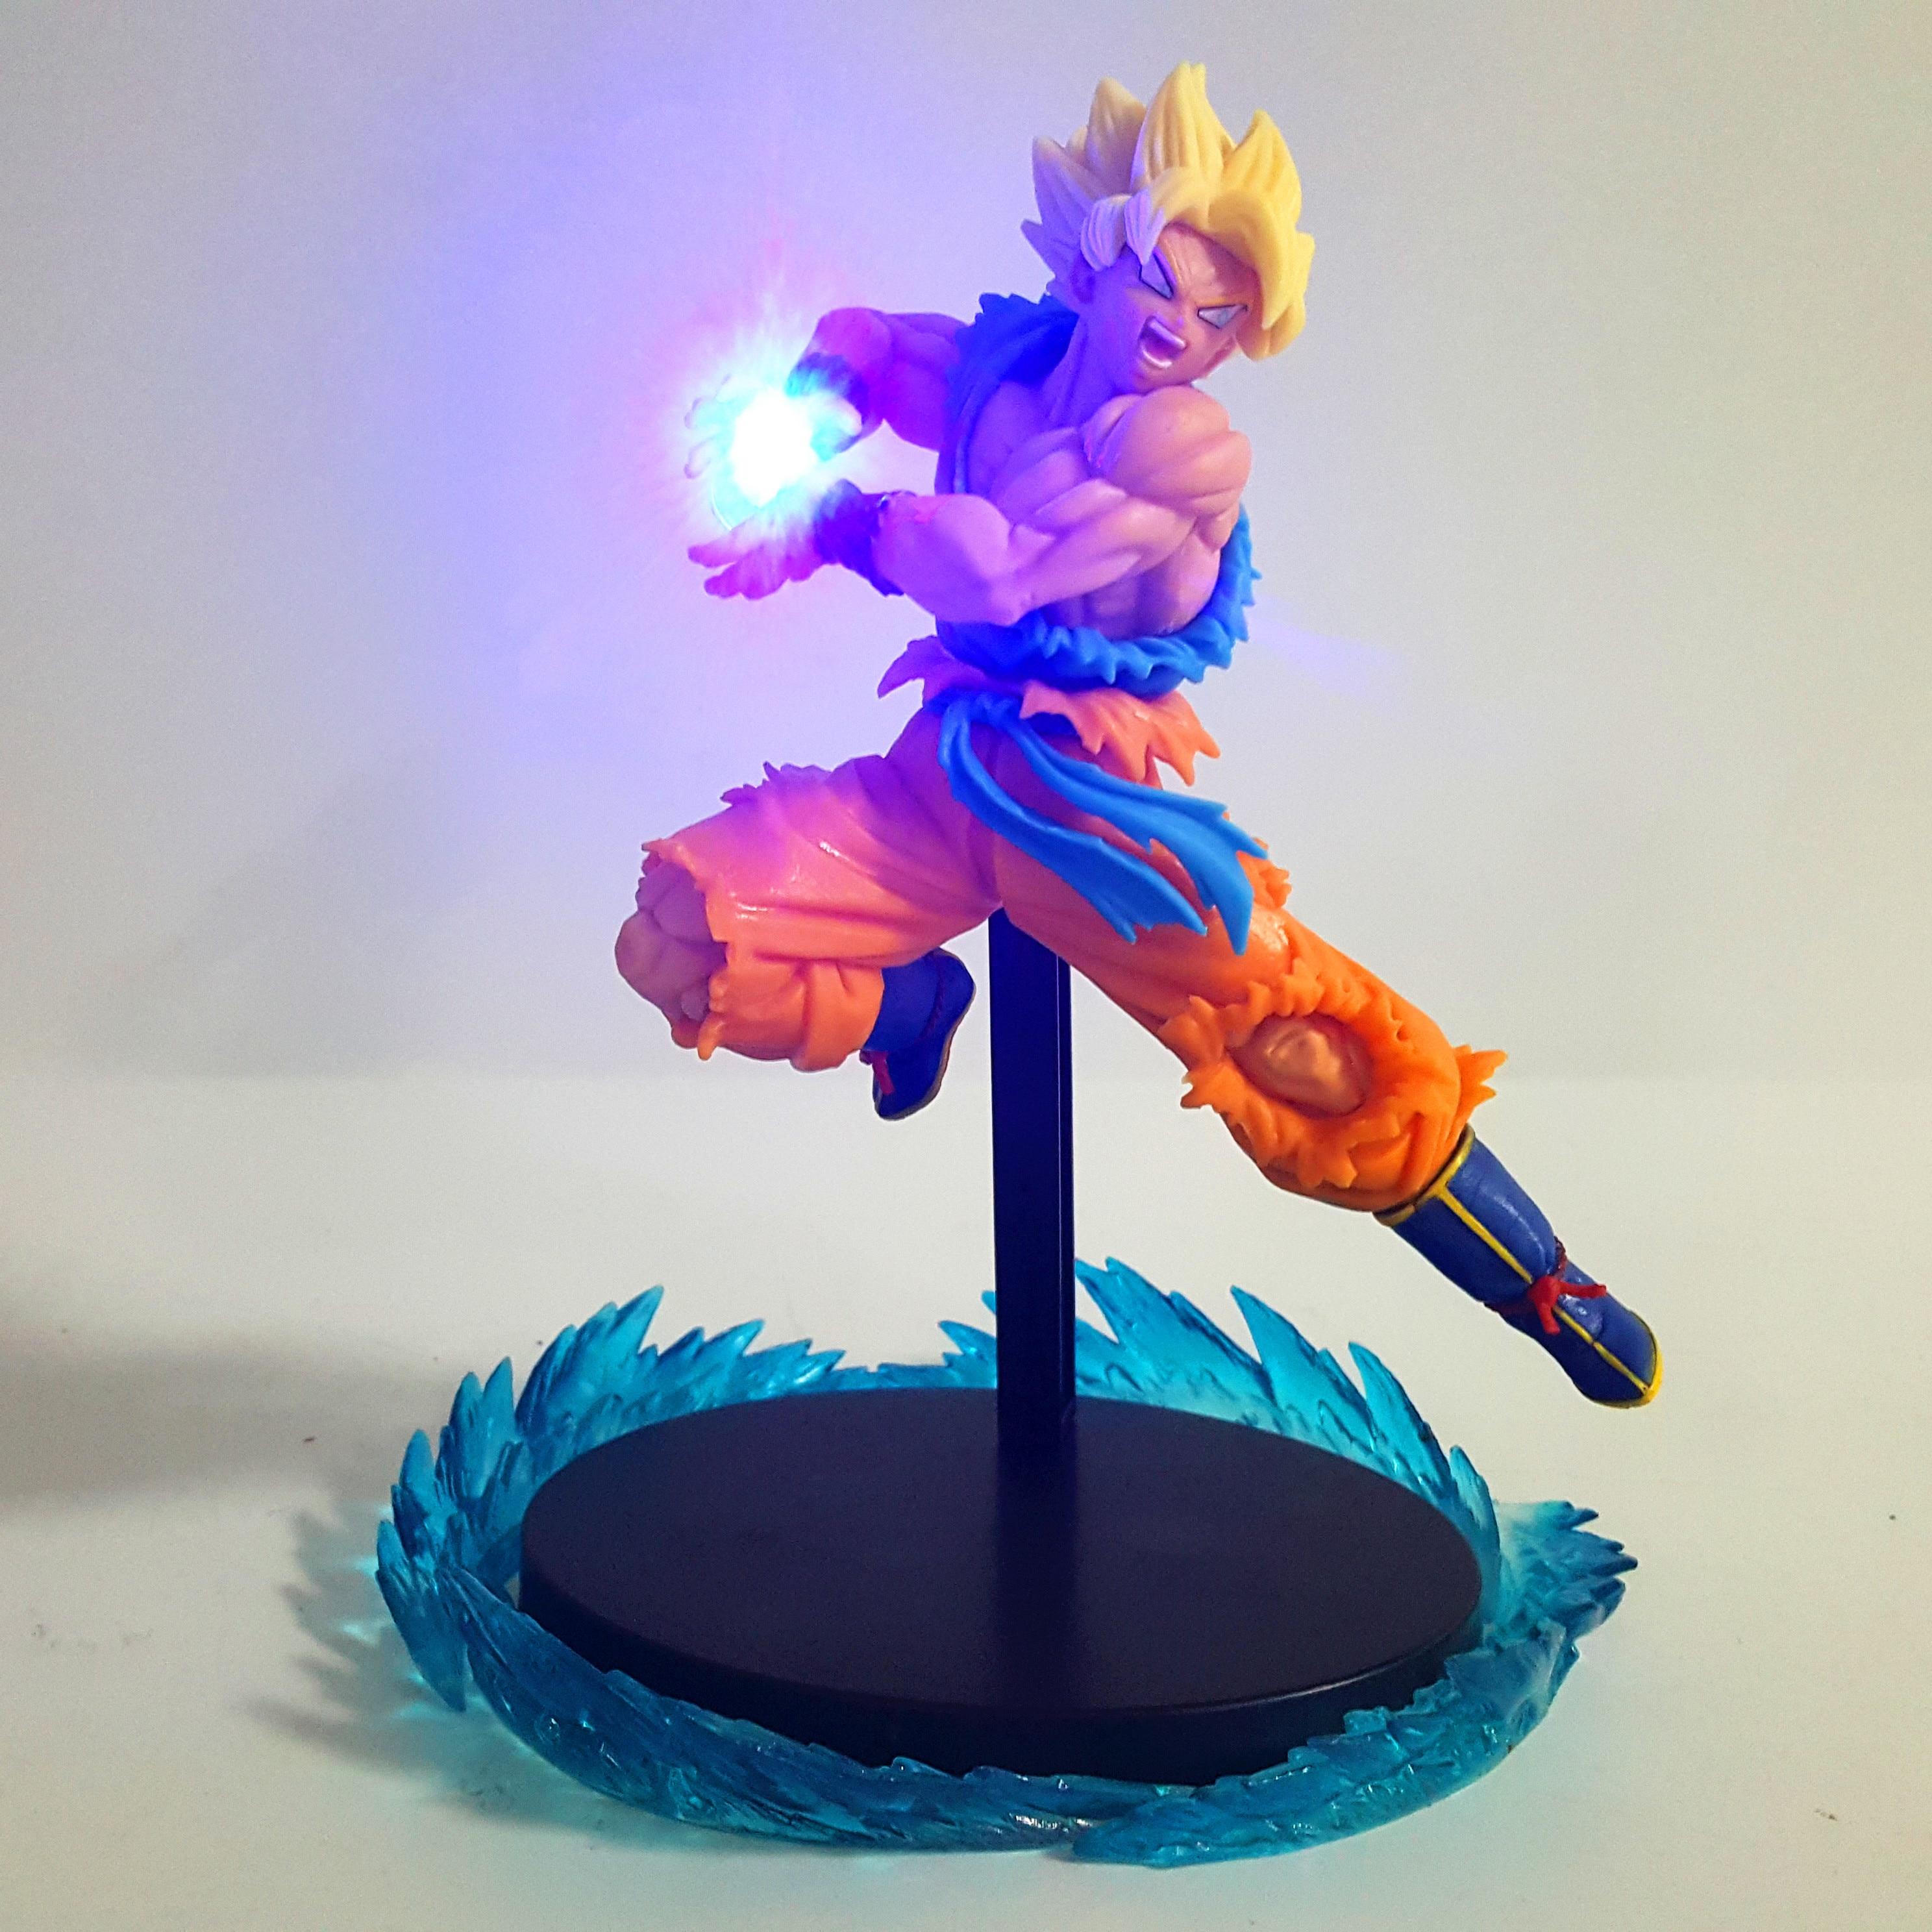 Dragon Ball Z Goku Super Saiyan 2 Kamehameha Led PVC Action Figures Dragon Ball Super Anime Son Goku Figurine DBZ Toy